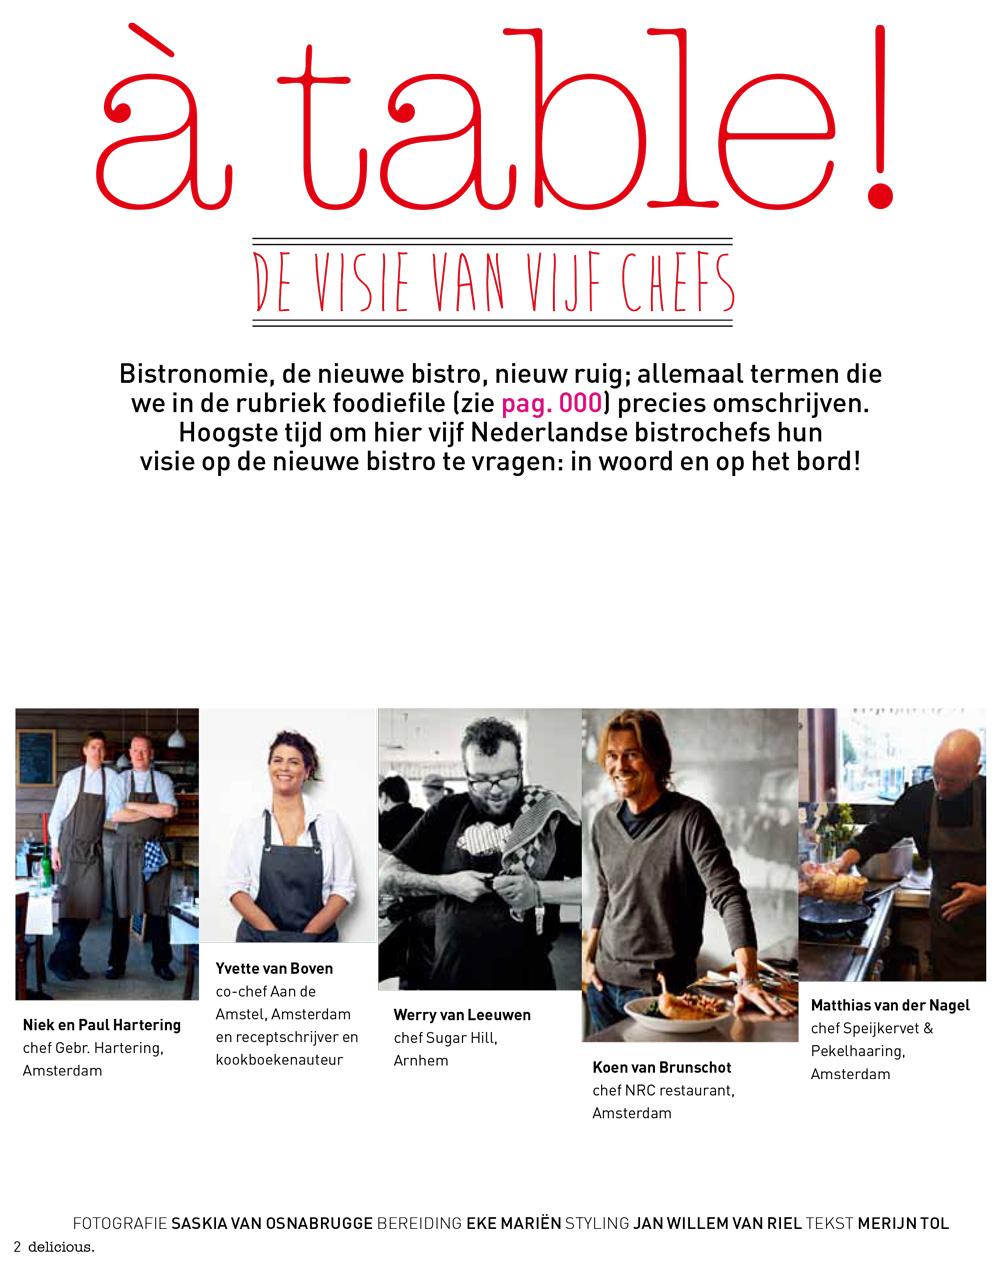 35-culinaire-2-Gastchef-bistronomie-1